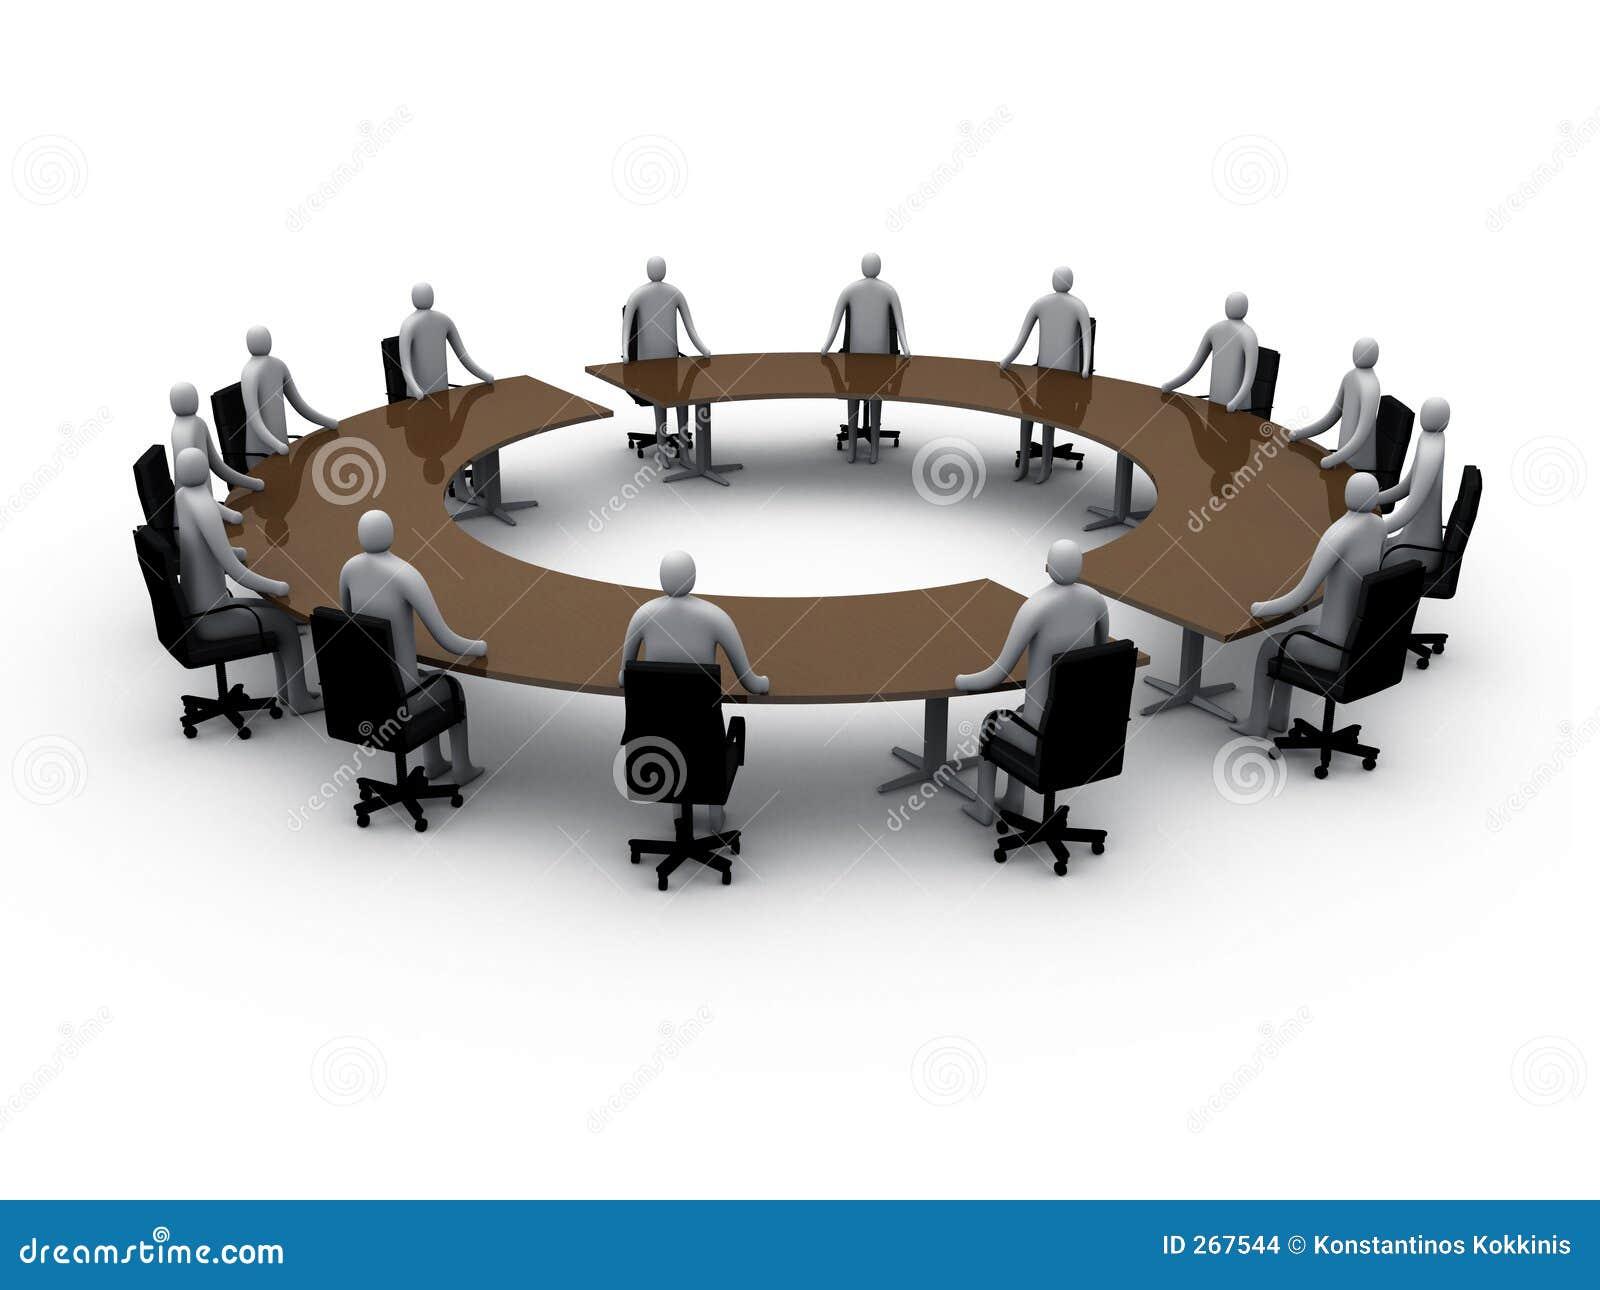 Pokój 5 konferencji